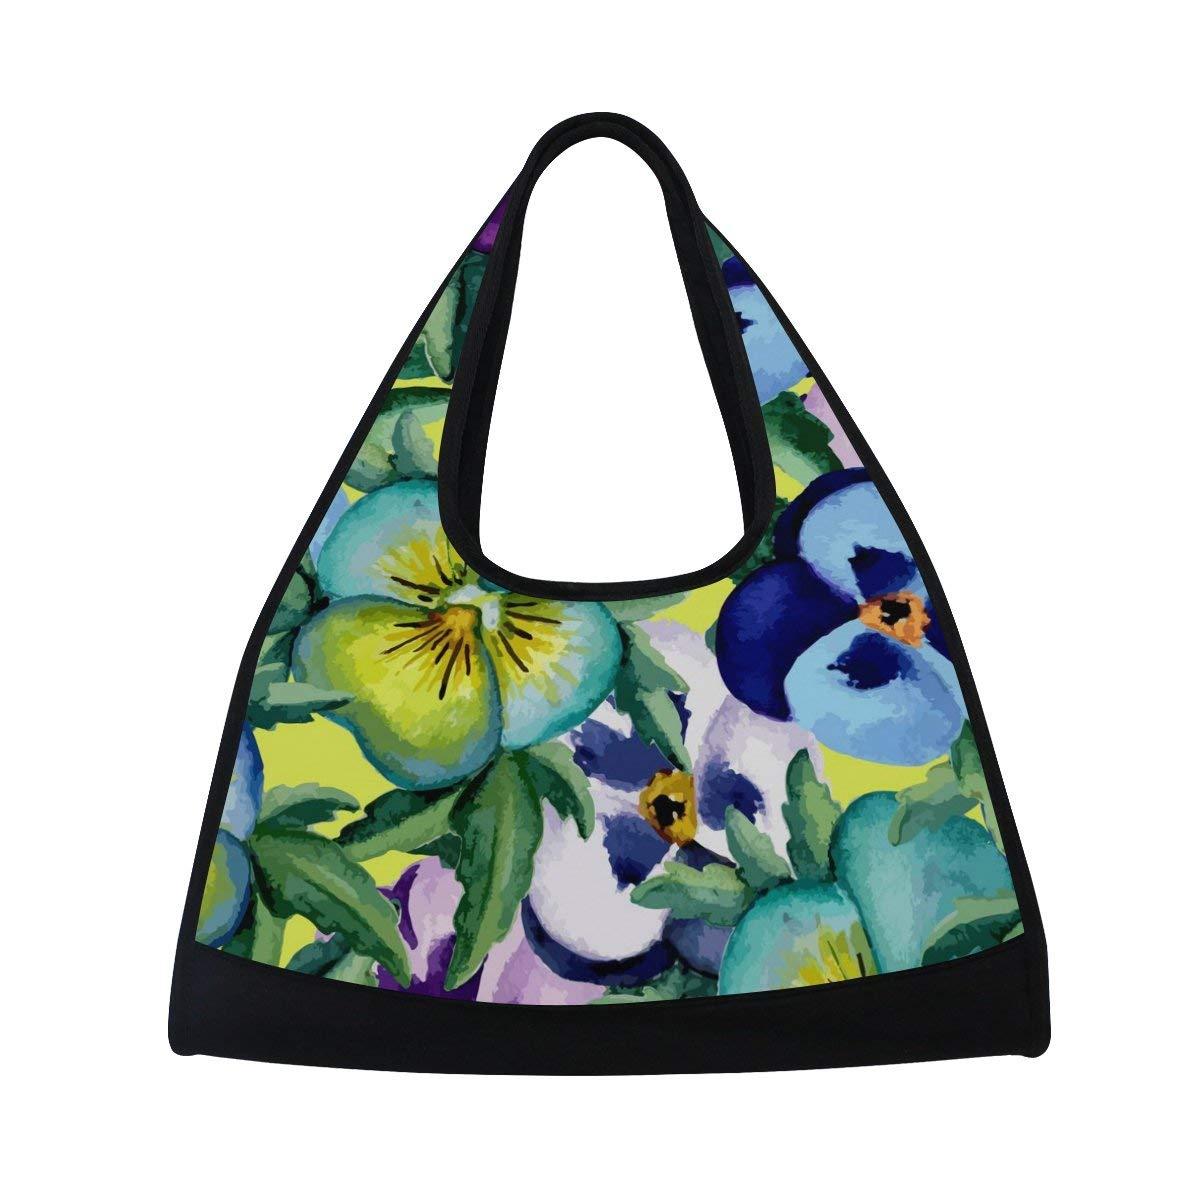 Sport Gym Bag Watercolor Flower Leaf Canvas Travel Duffel Bag